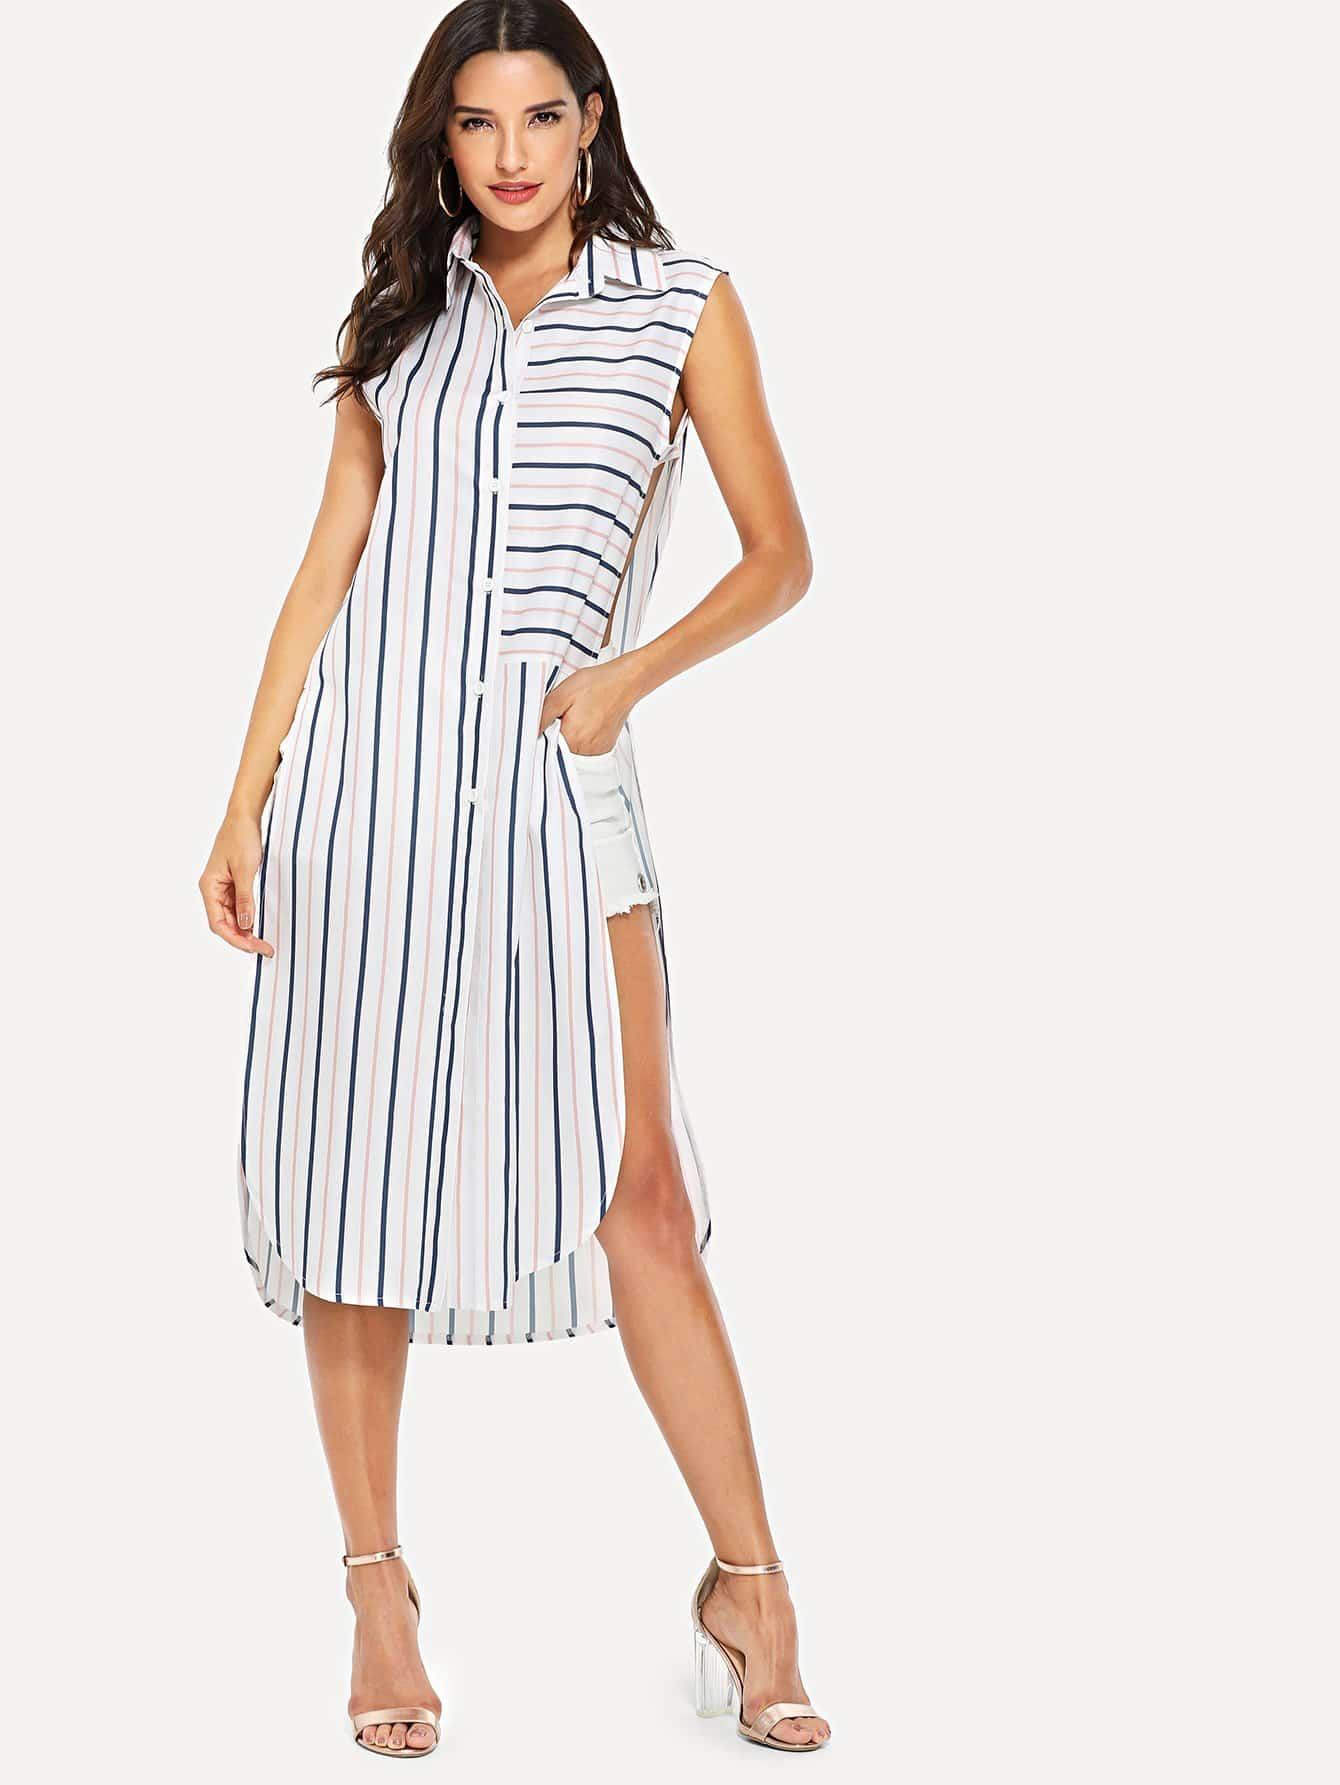 Cut Out Side Striped Longline Shirt black longline gilet with side cut details